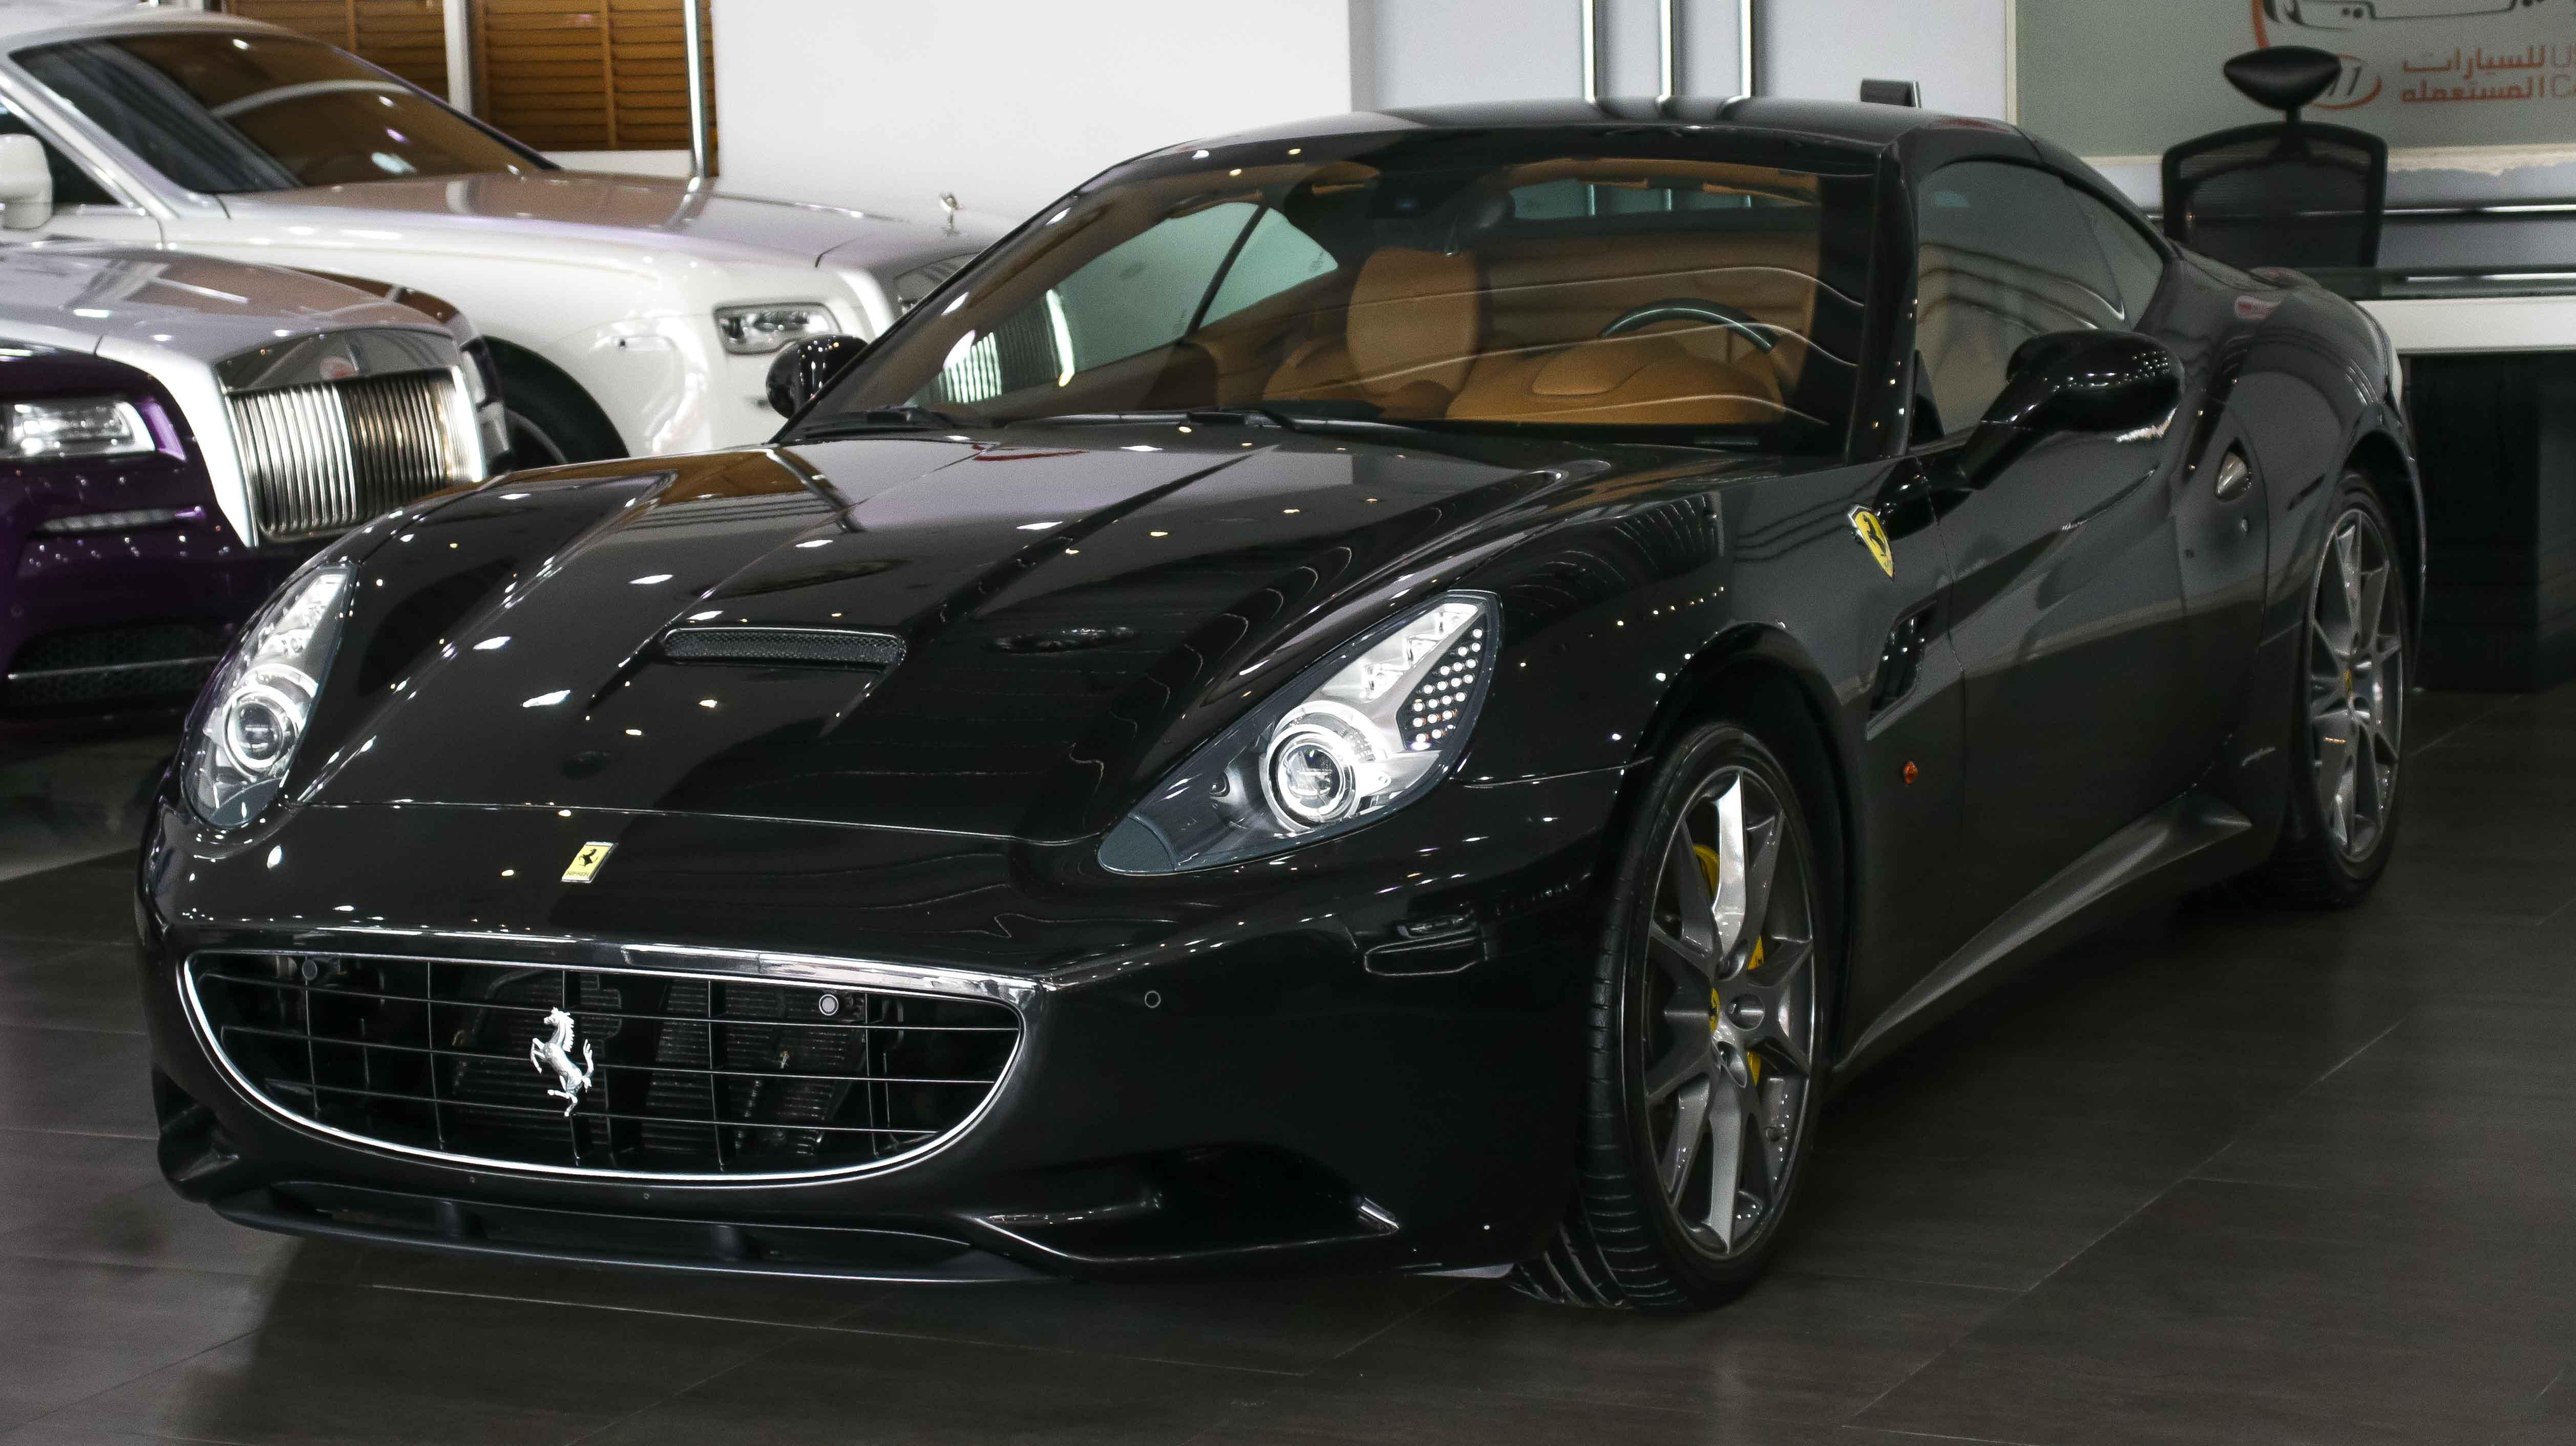 2010 Ferrari California Black Beige 01 Kargal Dealers Uae